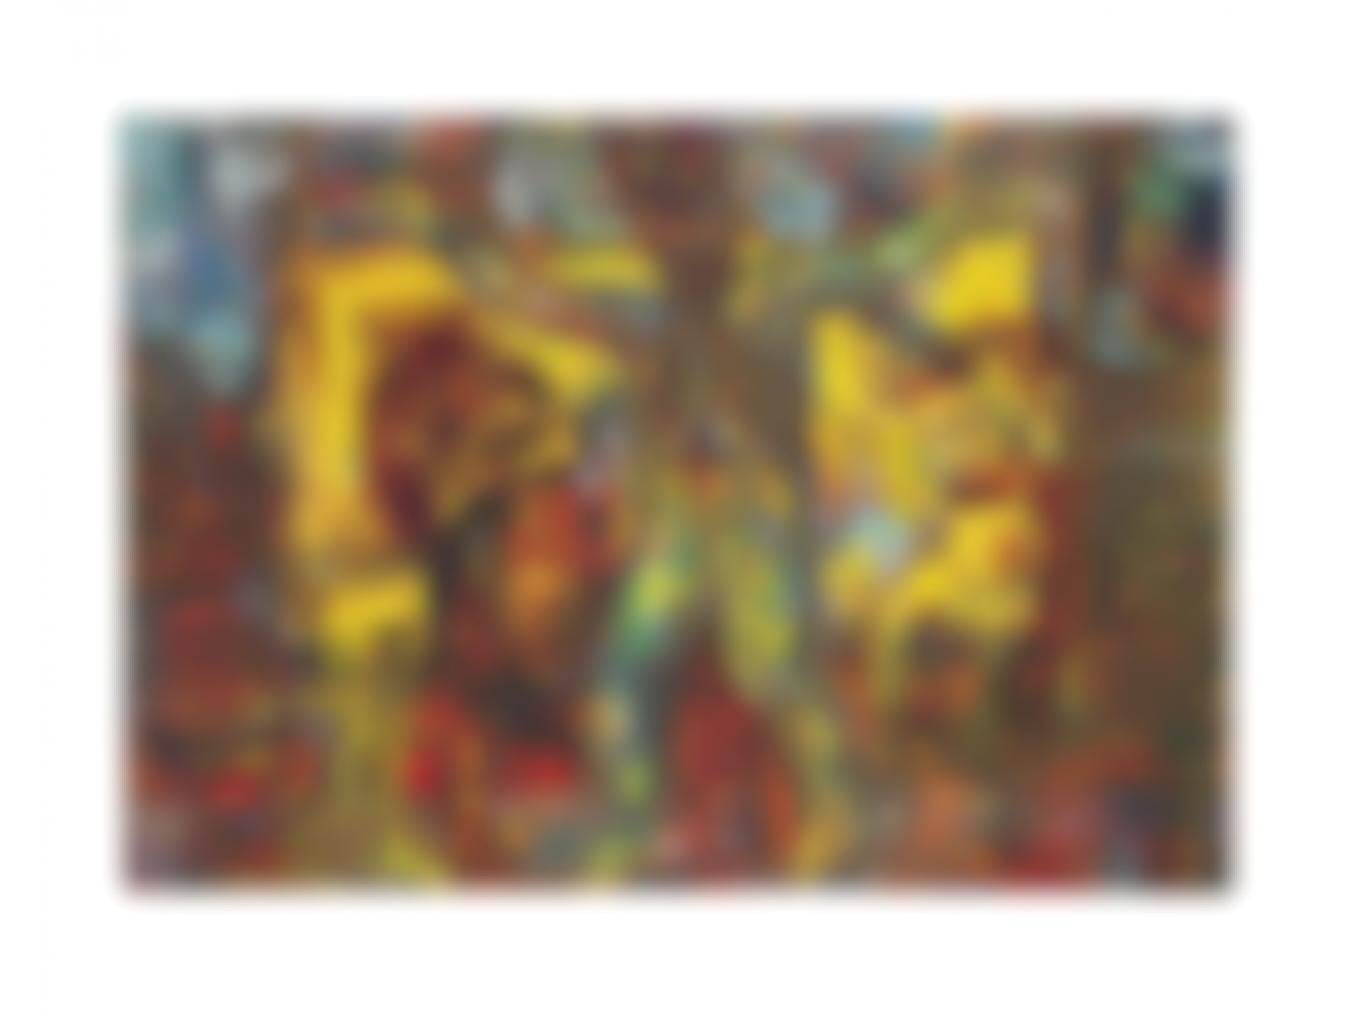 Arnaldo Roche Rabell-The Tease-1989